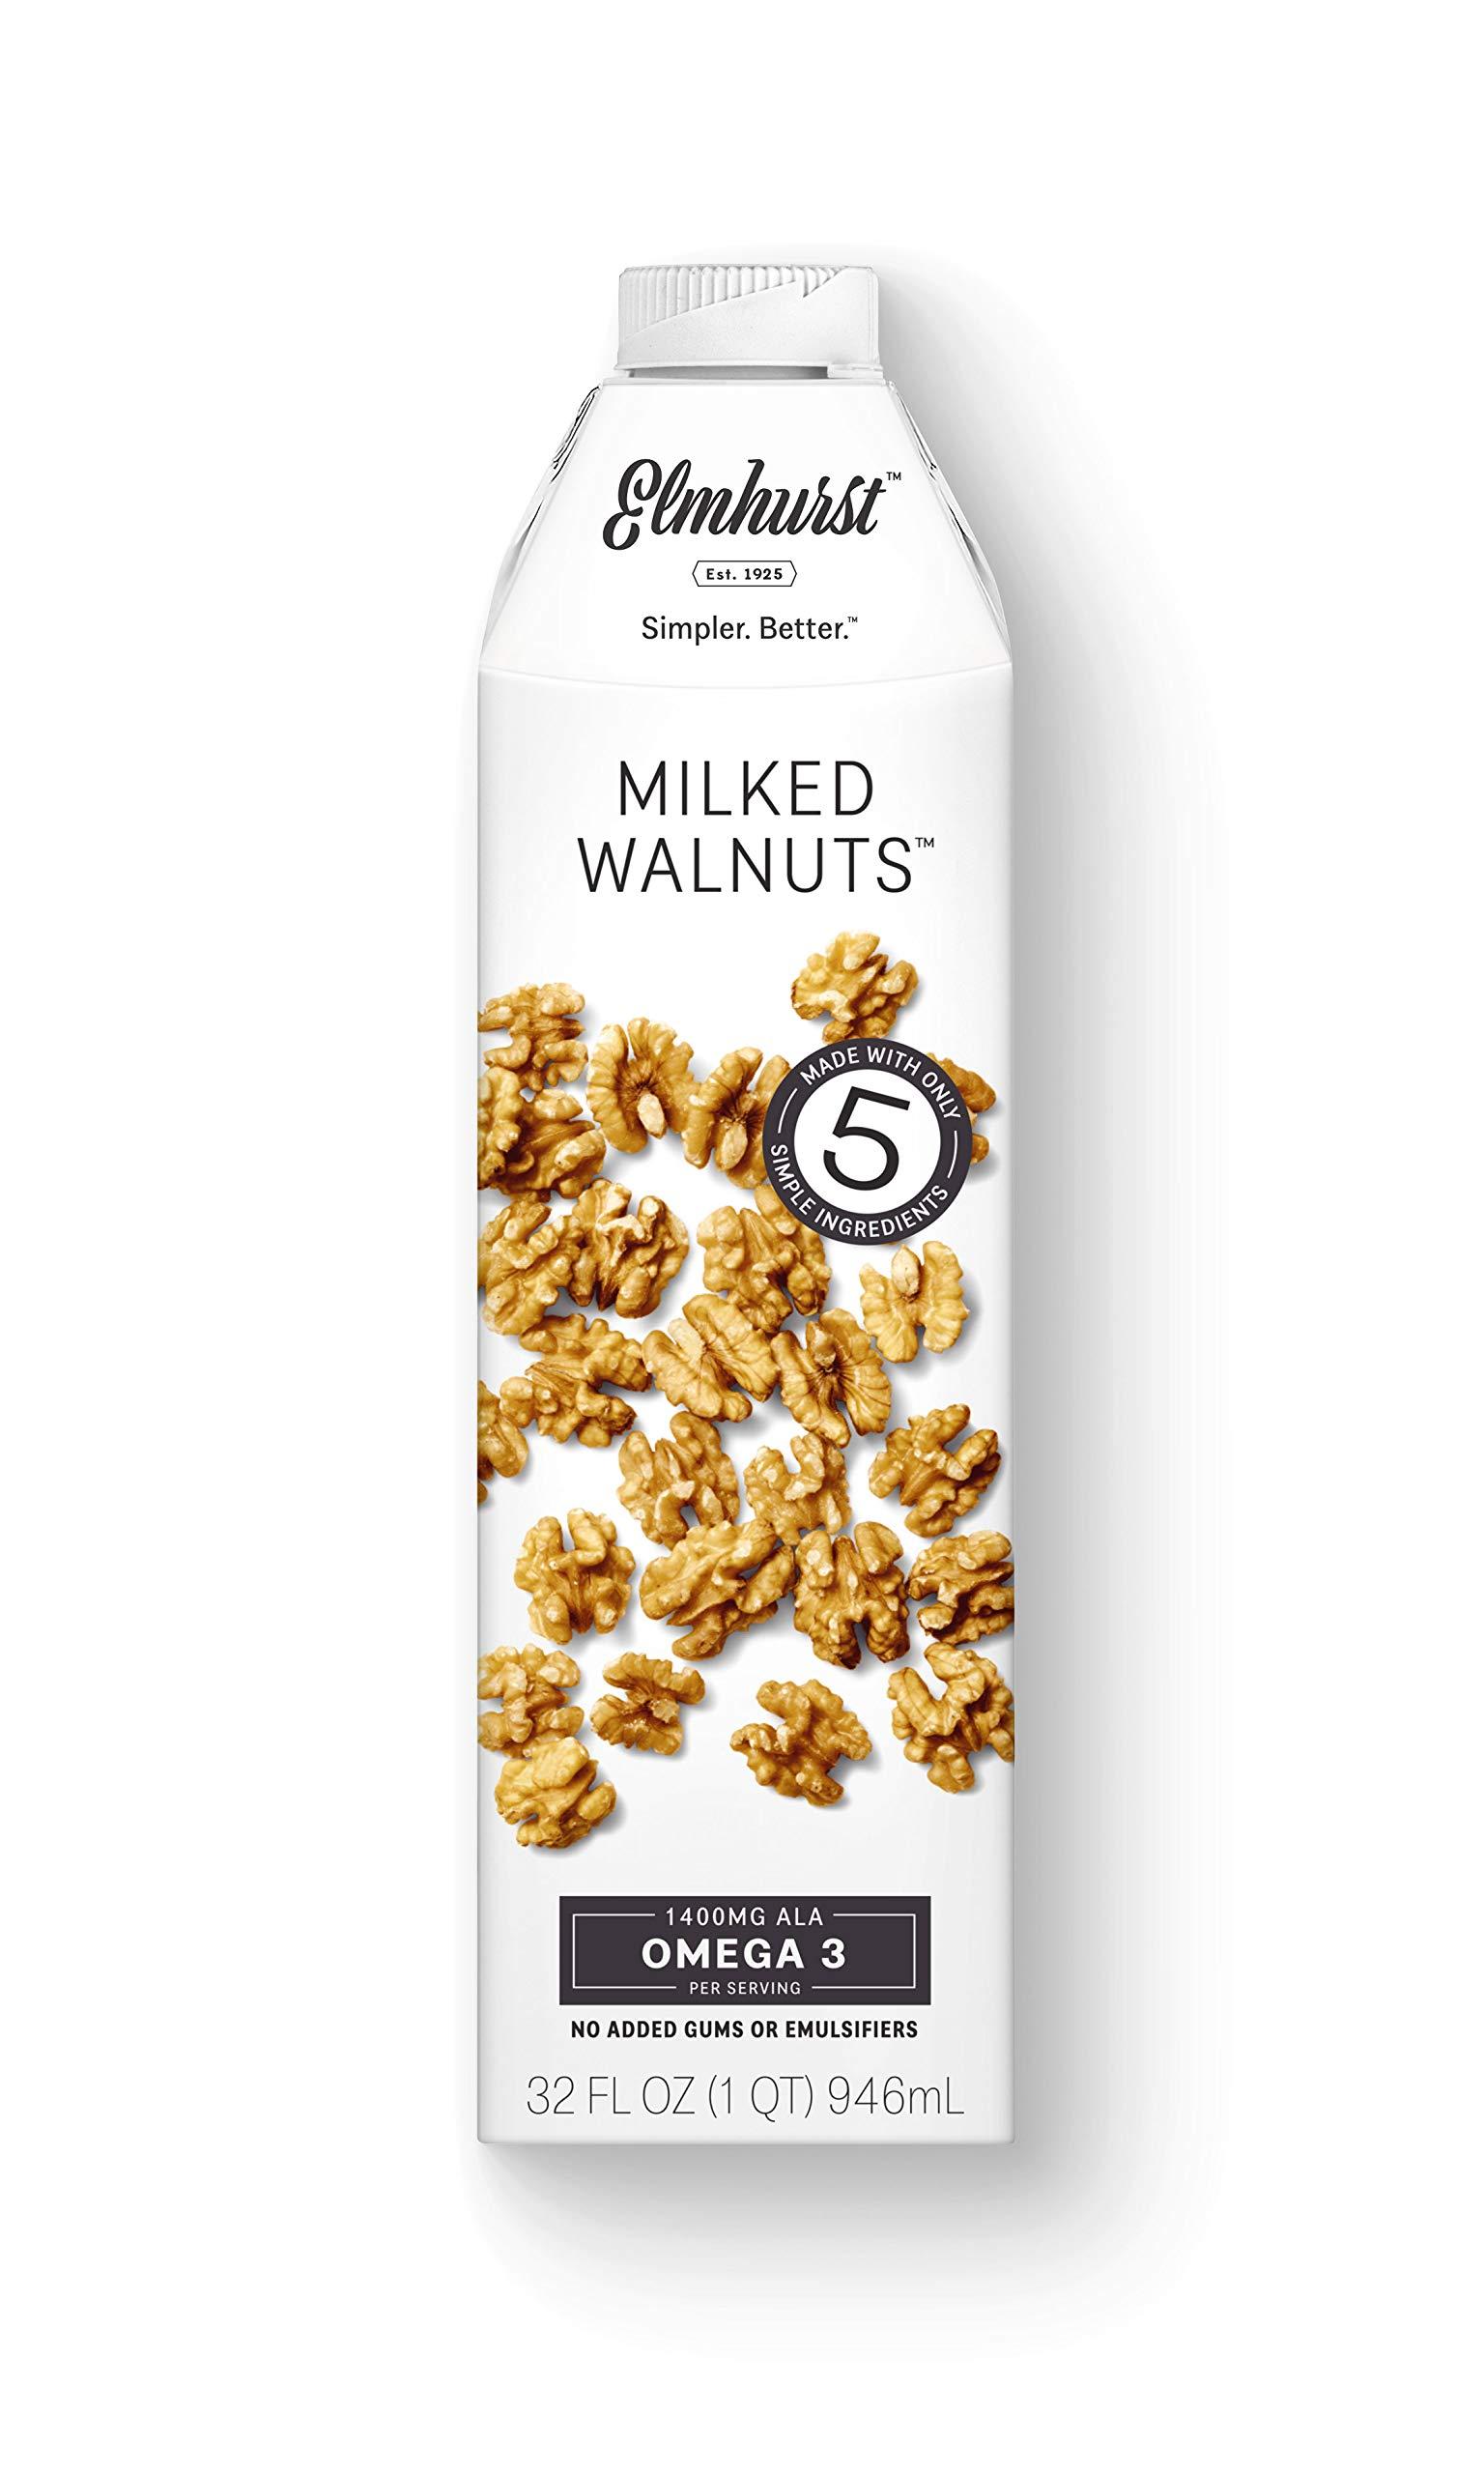 Elmhurst 1925 Walnut Milk, 32 Ounce (Pack of 6)